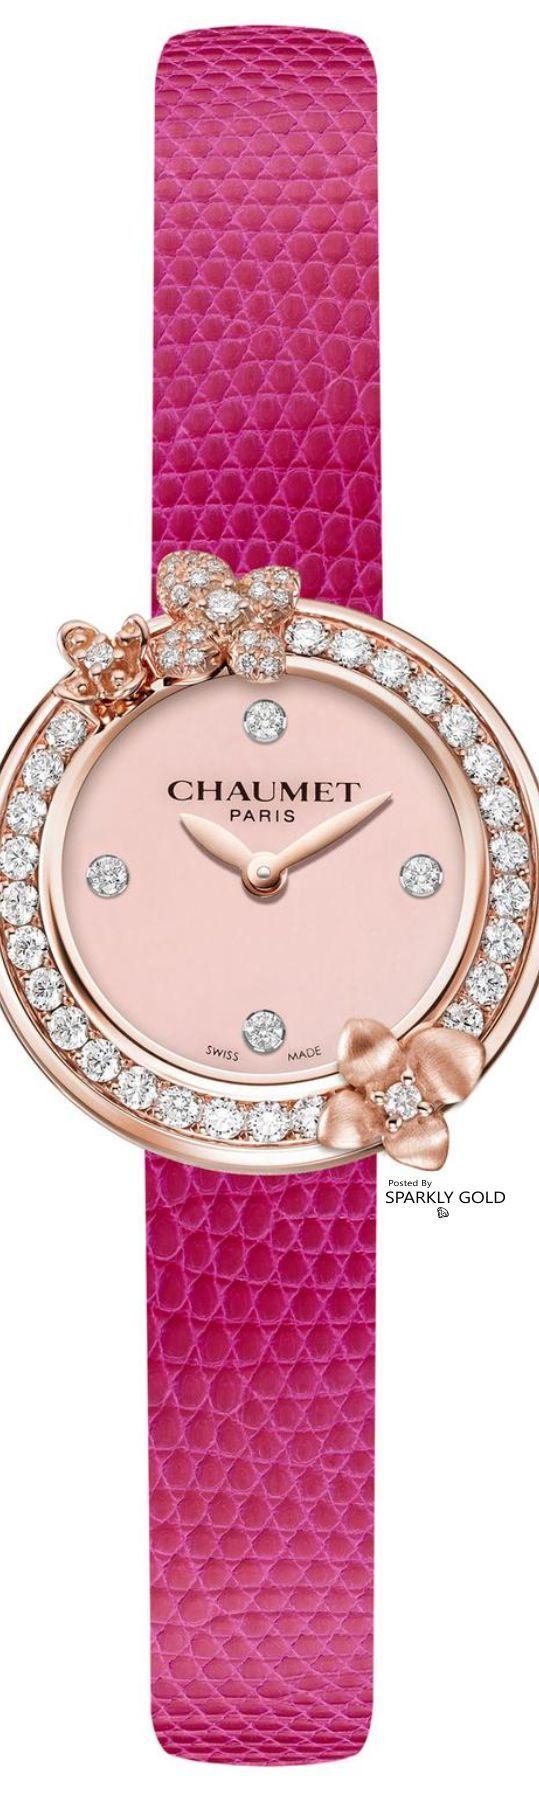 Chaumet Watch Lady